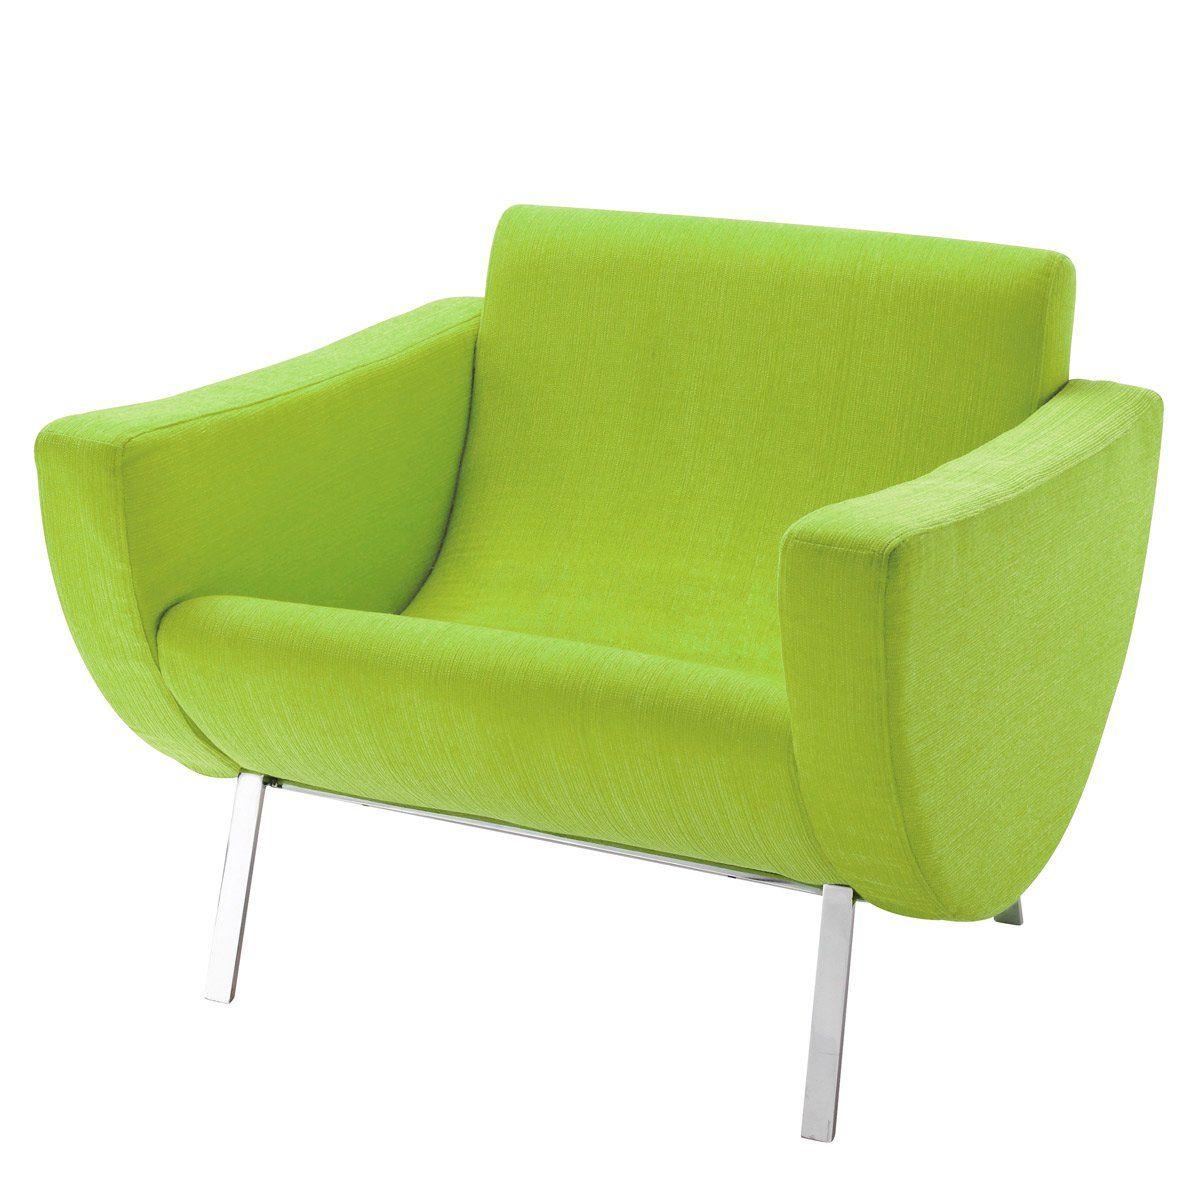 Vintage-Sessel grün MANDARINE